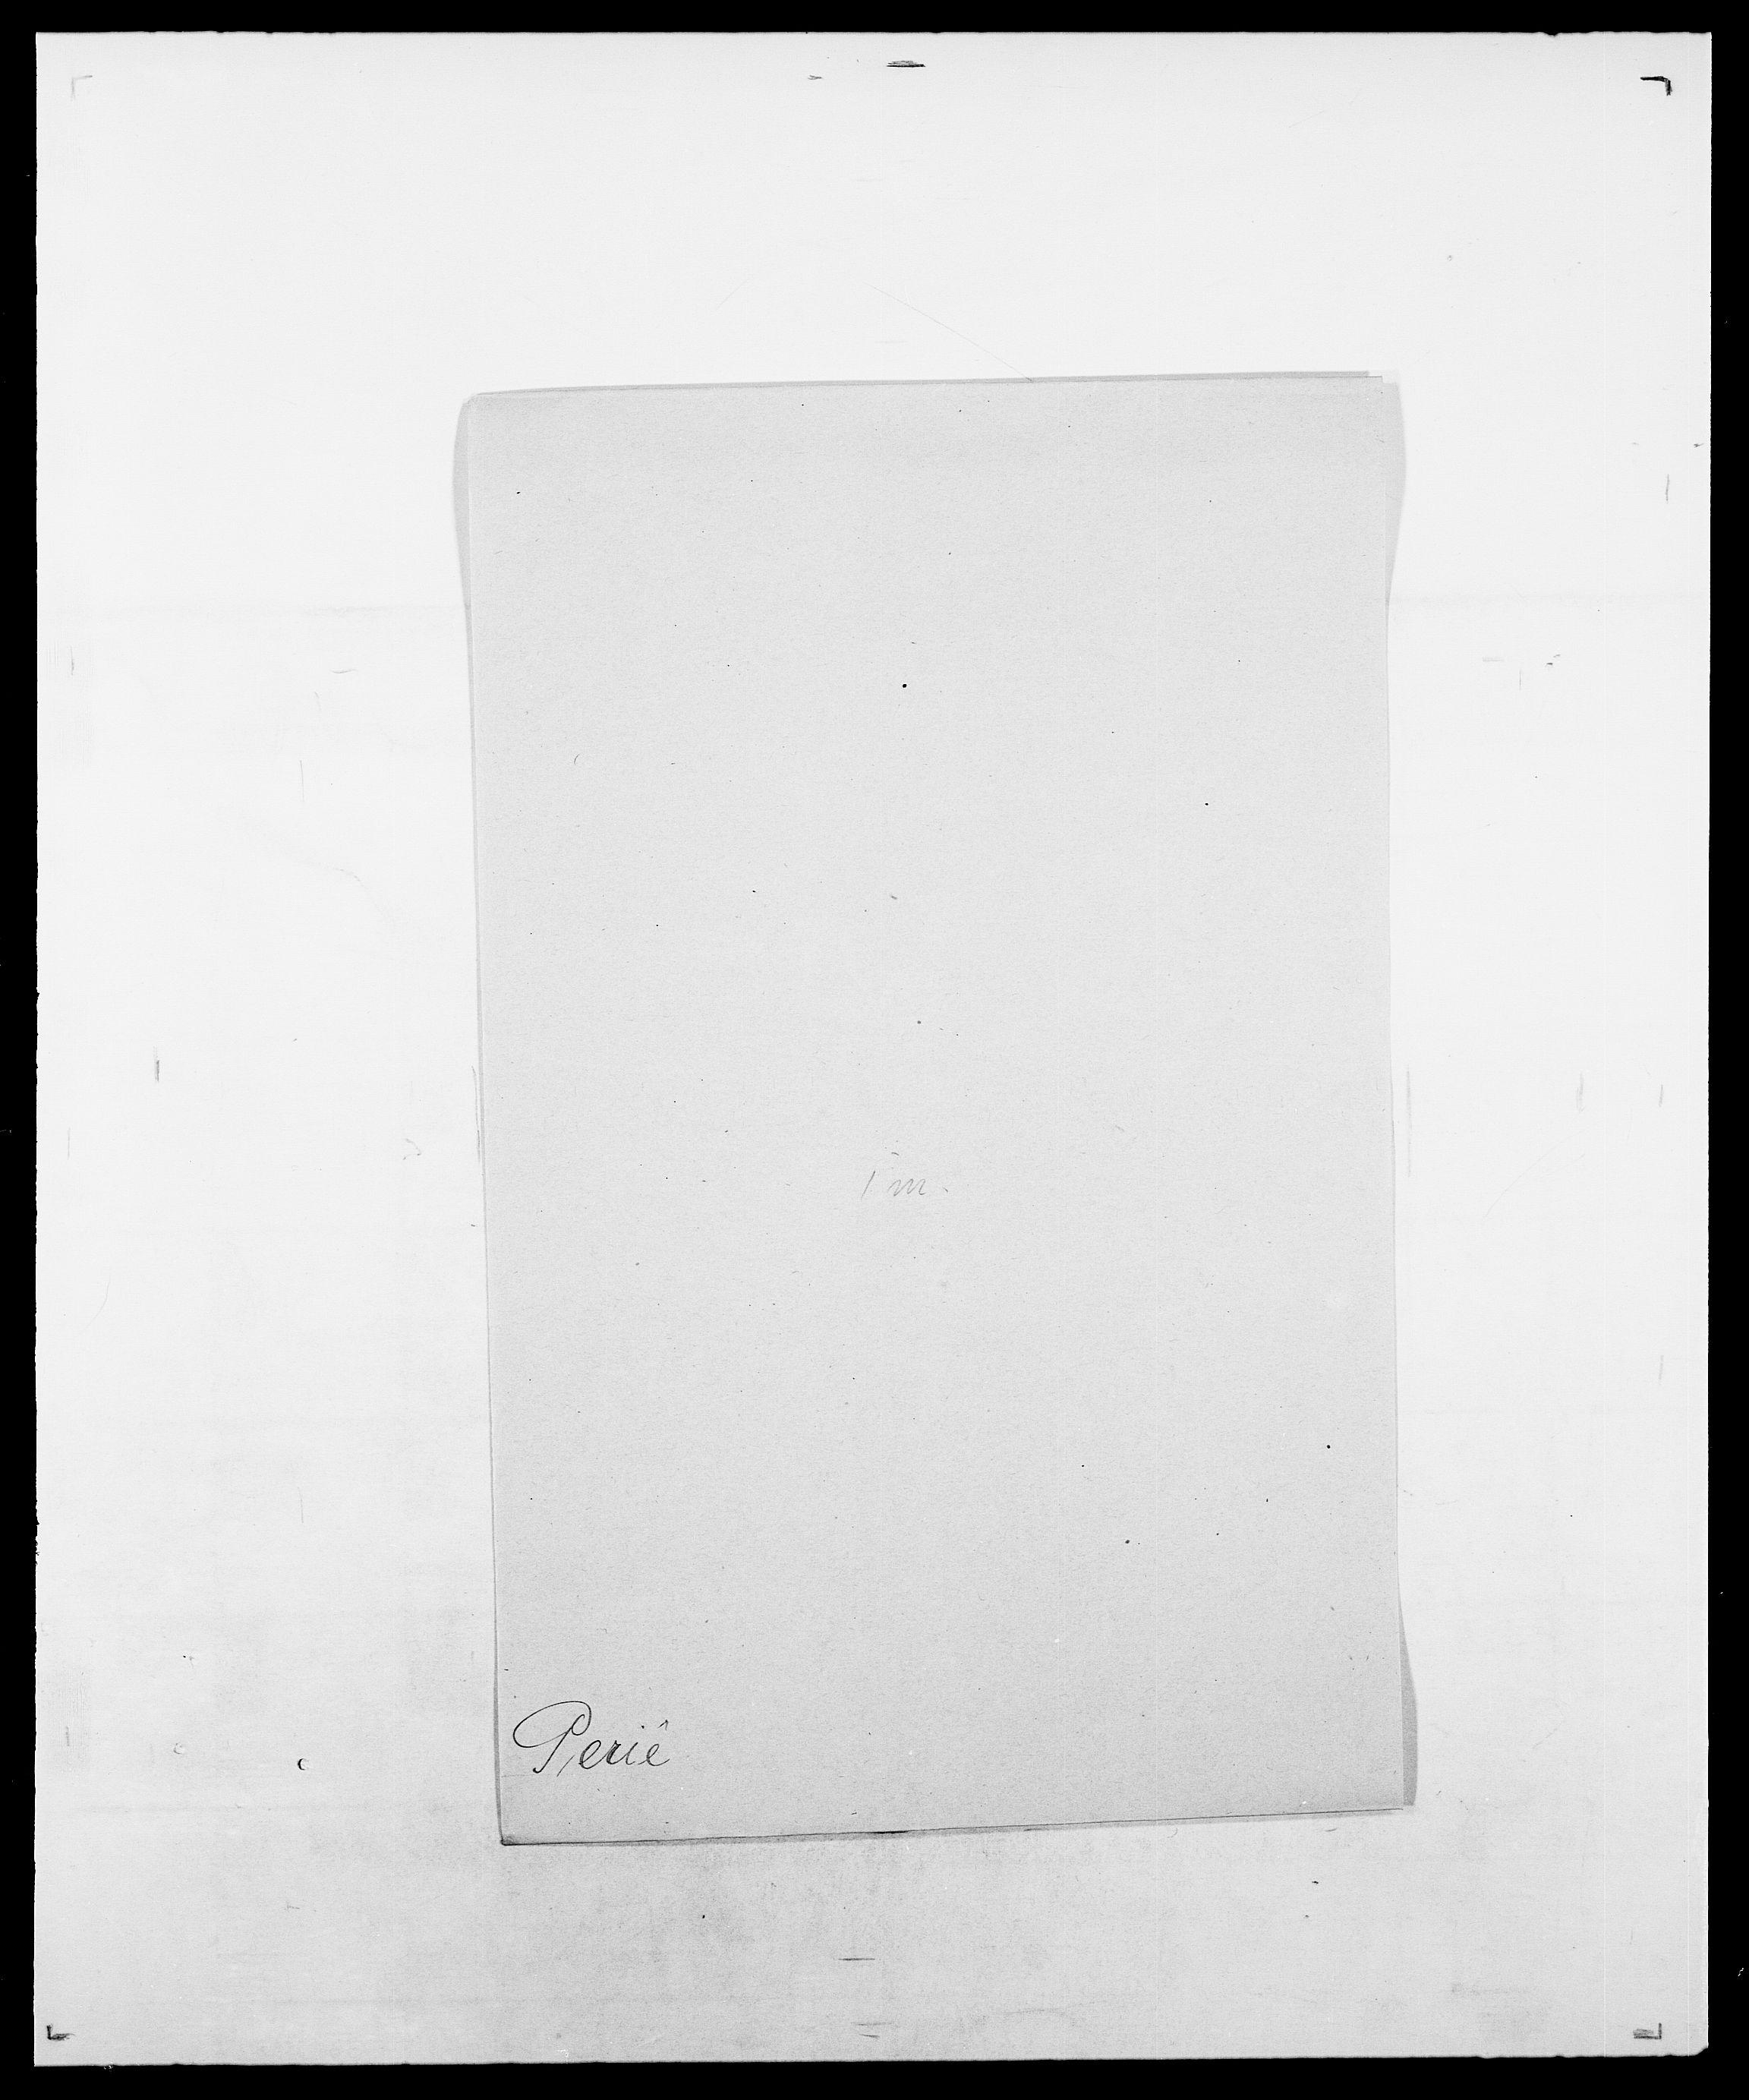 SAO, Delgobe, Charles Antoine - samling, D/Da/L0030: Paars - Pittelkov, s. 365